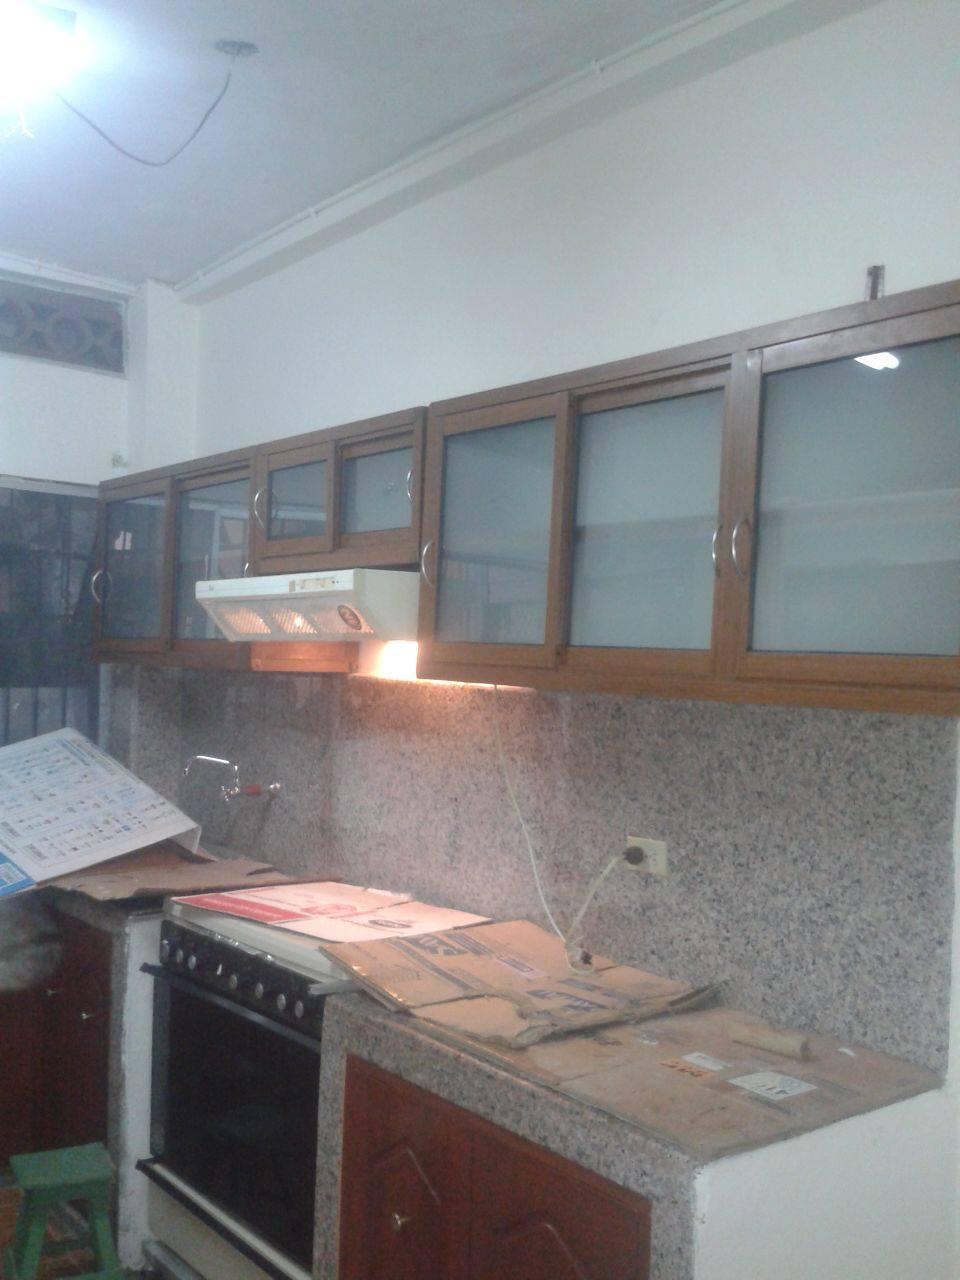 Anaqueles de cocina car al vi - Cocina aluminio ...